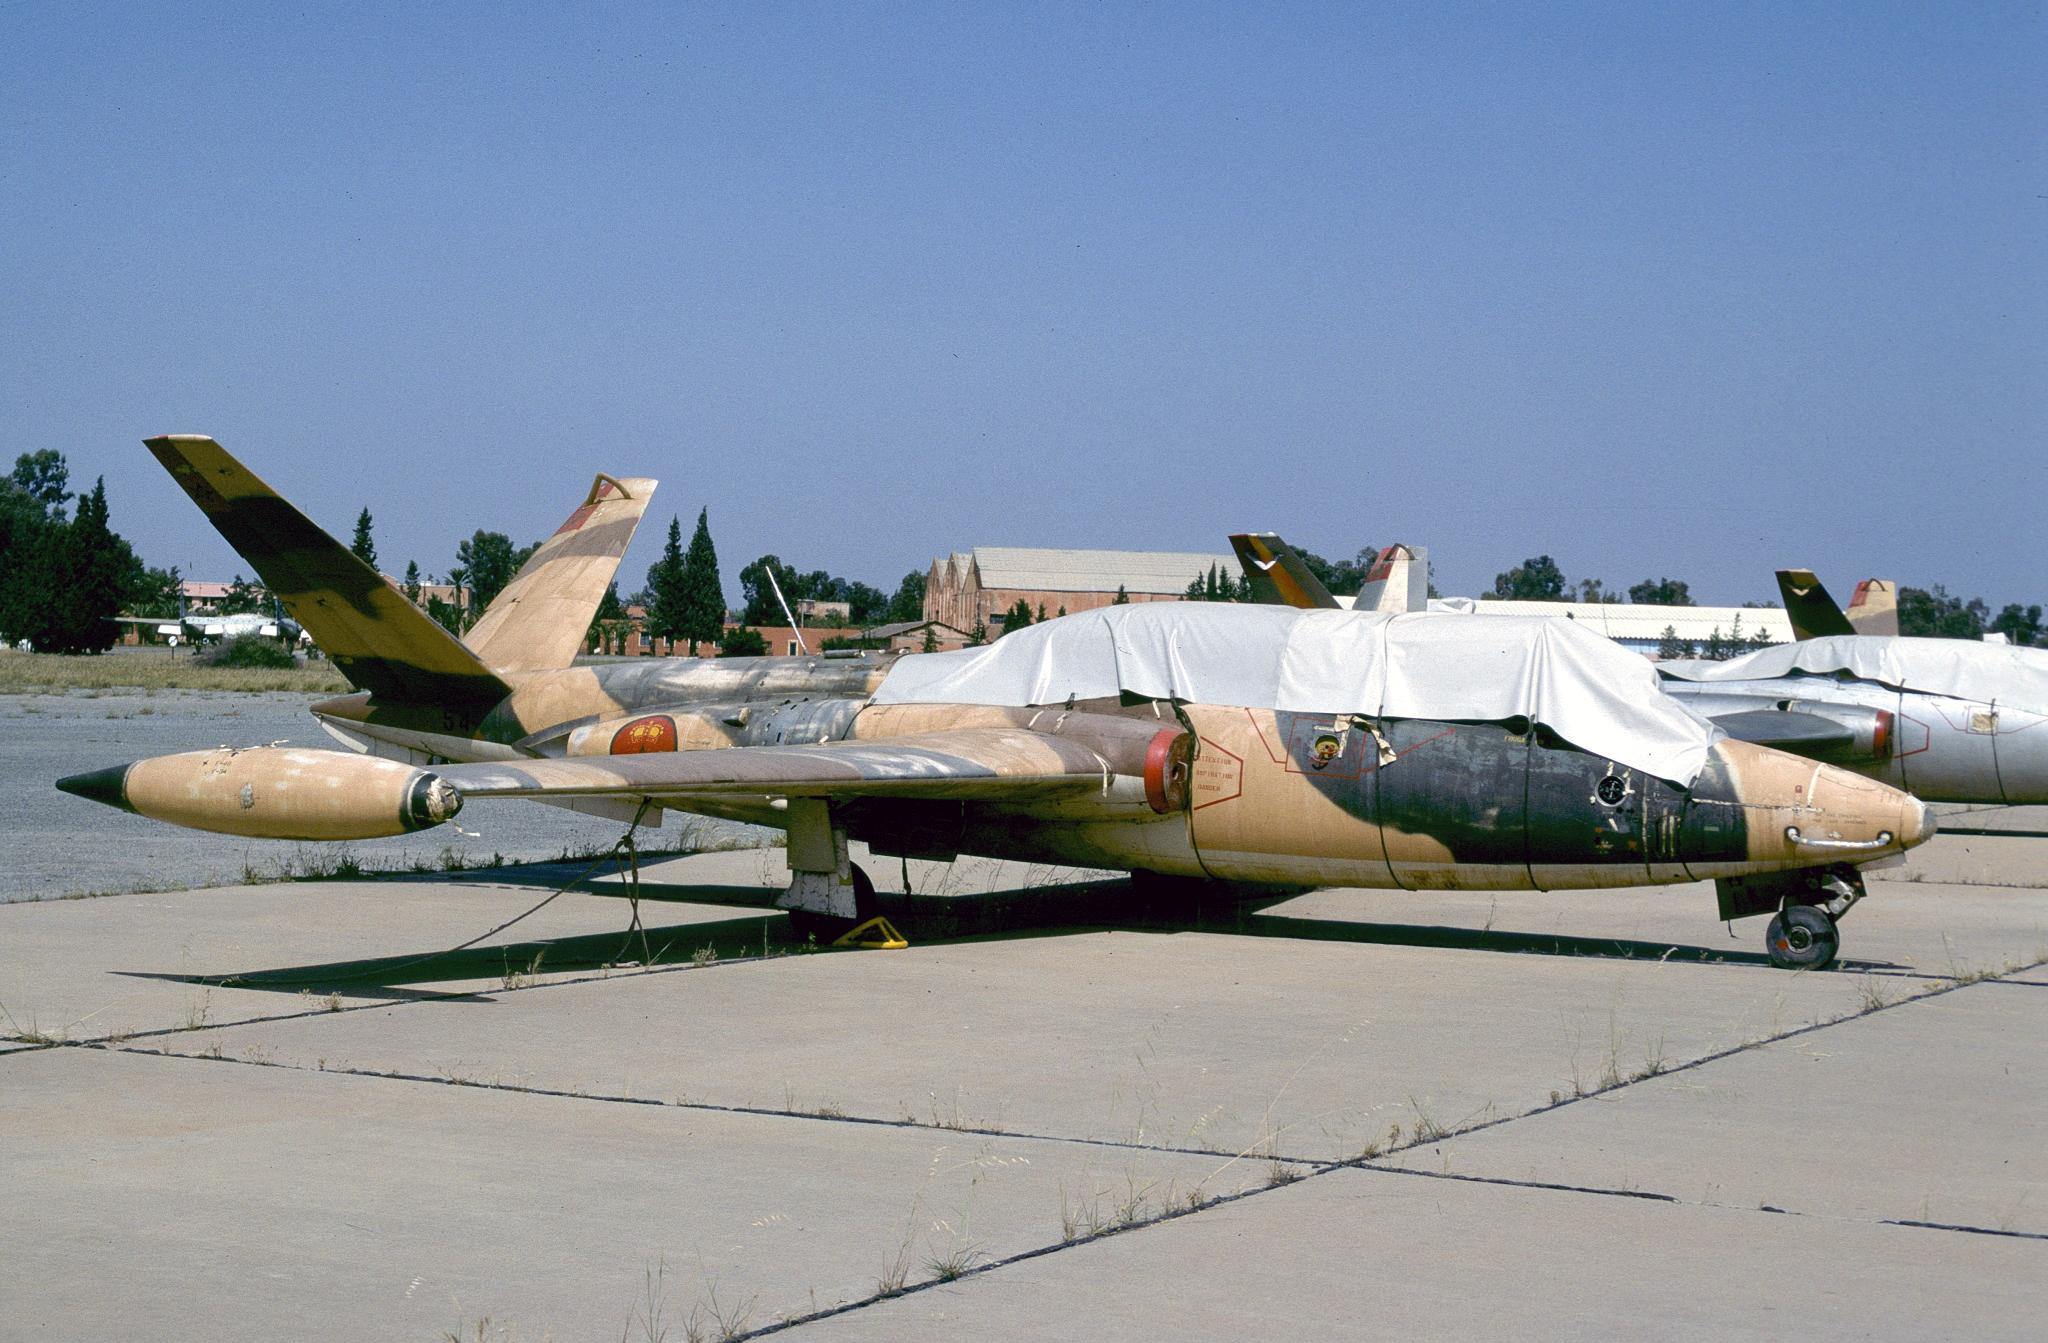 FRA: Photos anciens avions des FRA - Page 13 31192366922_a4f88273b5_o_d